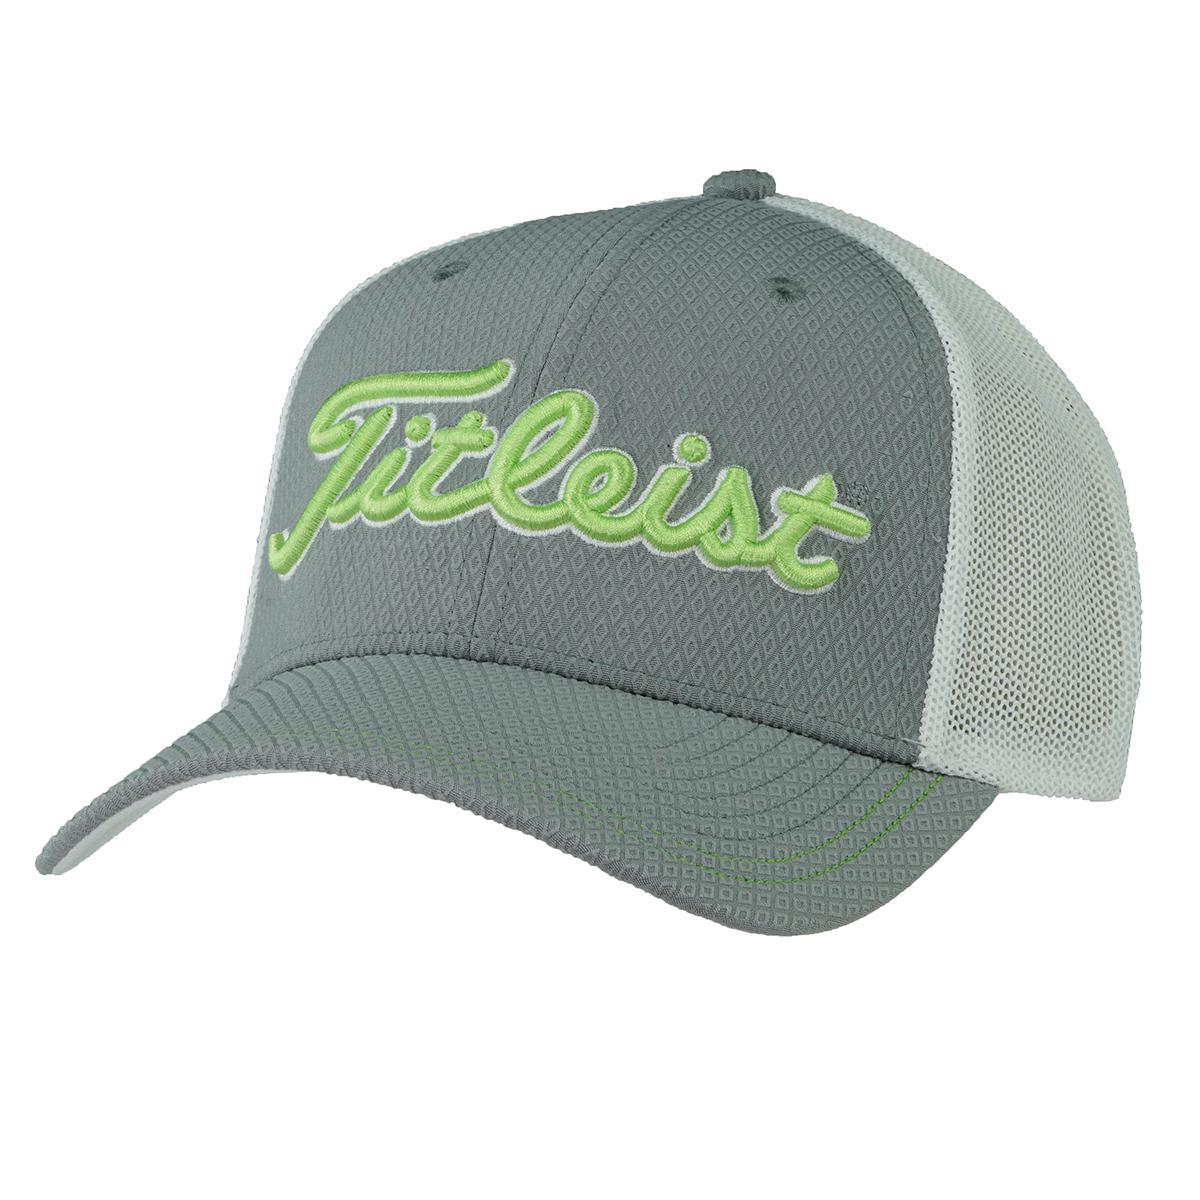 23907e9b Details about Titleist Men's Mesh Canvas Trucker Hat Grey/Lime Green S/M